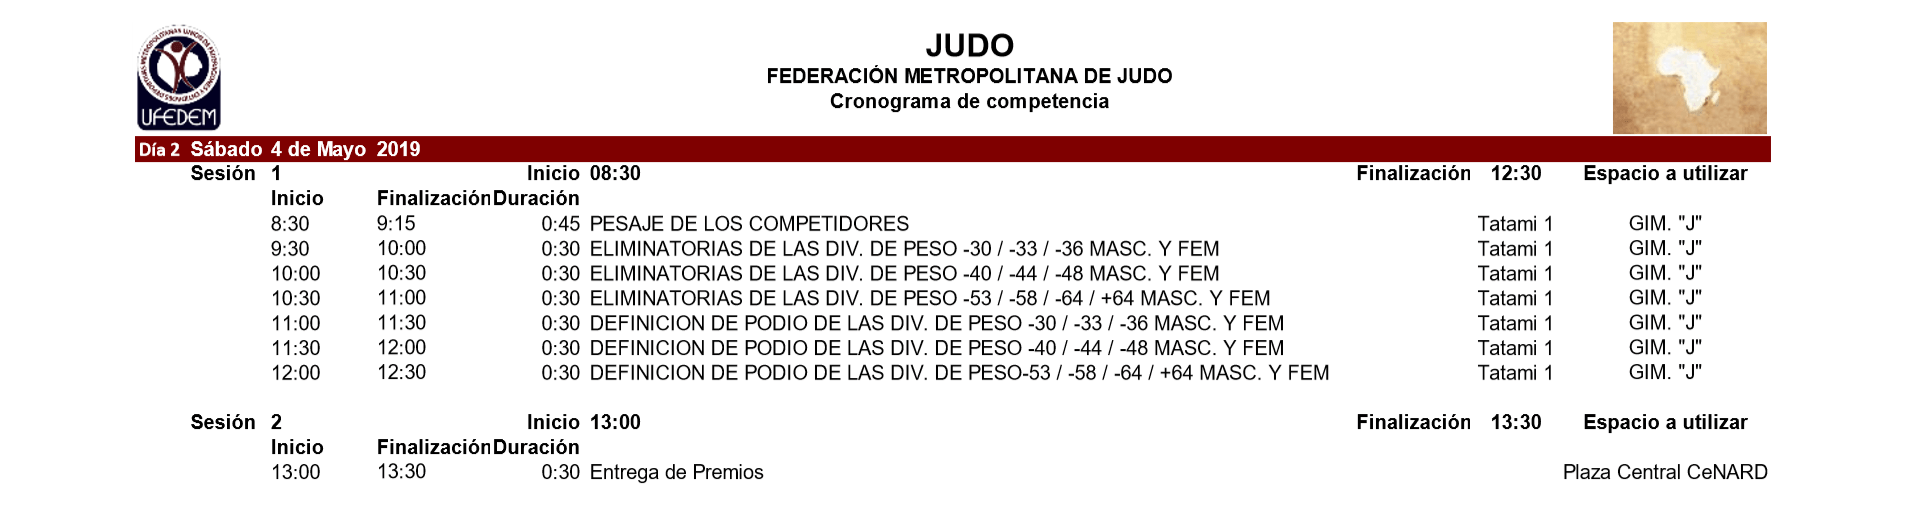 Judo 2.1 - Cronograma